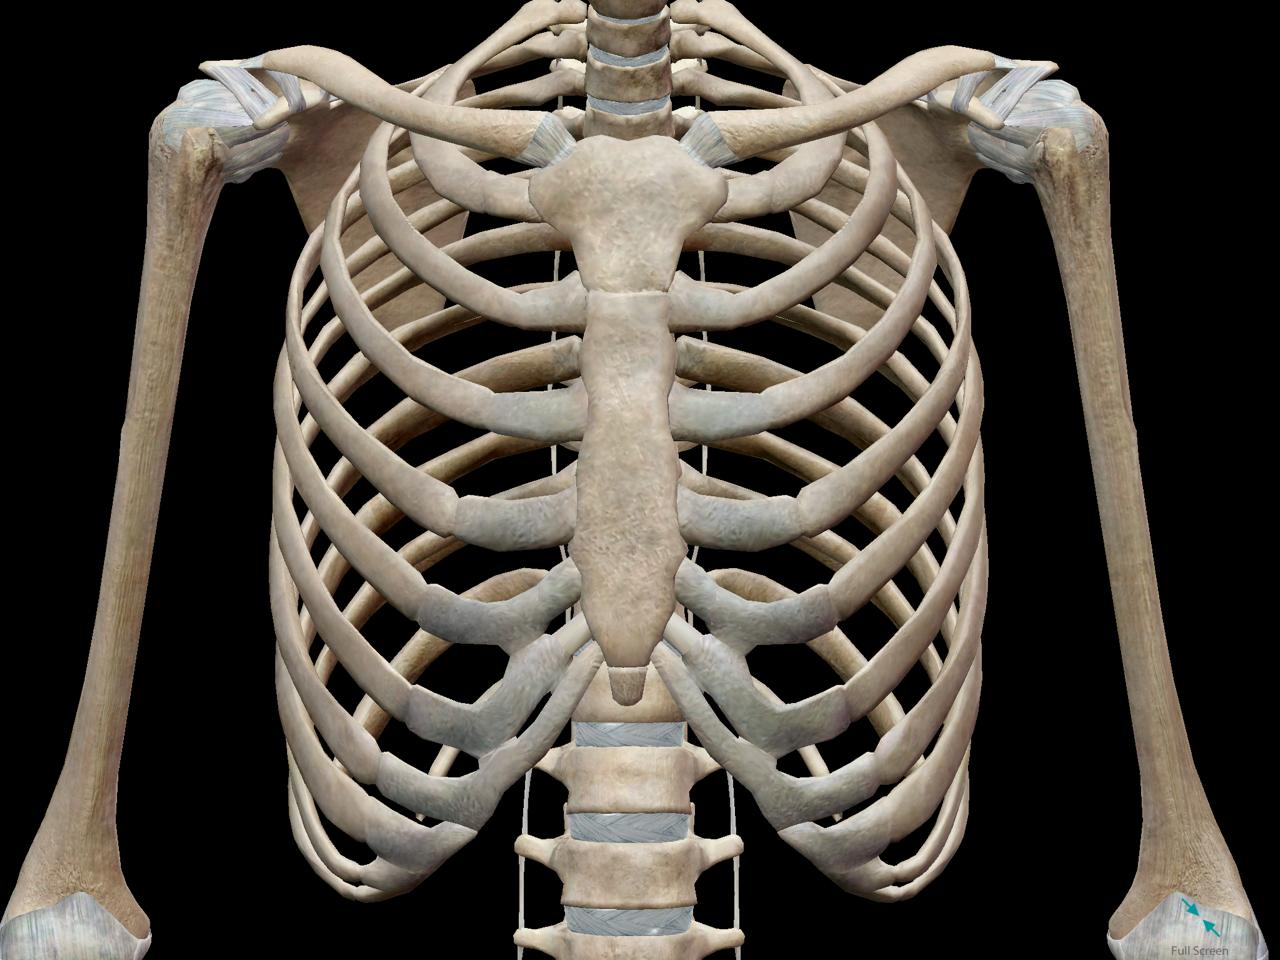 Human Rib Cage Anatomy Image collections - human body anatomy